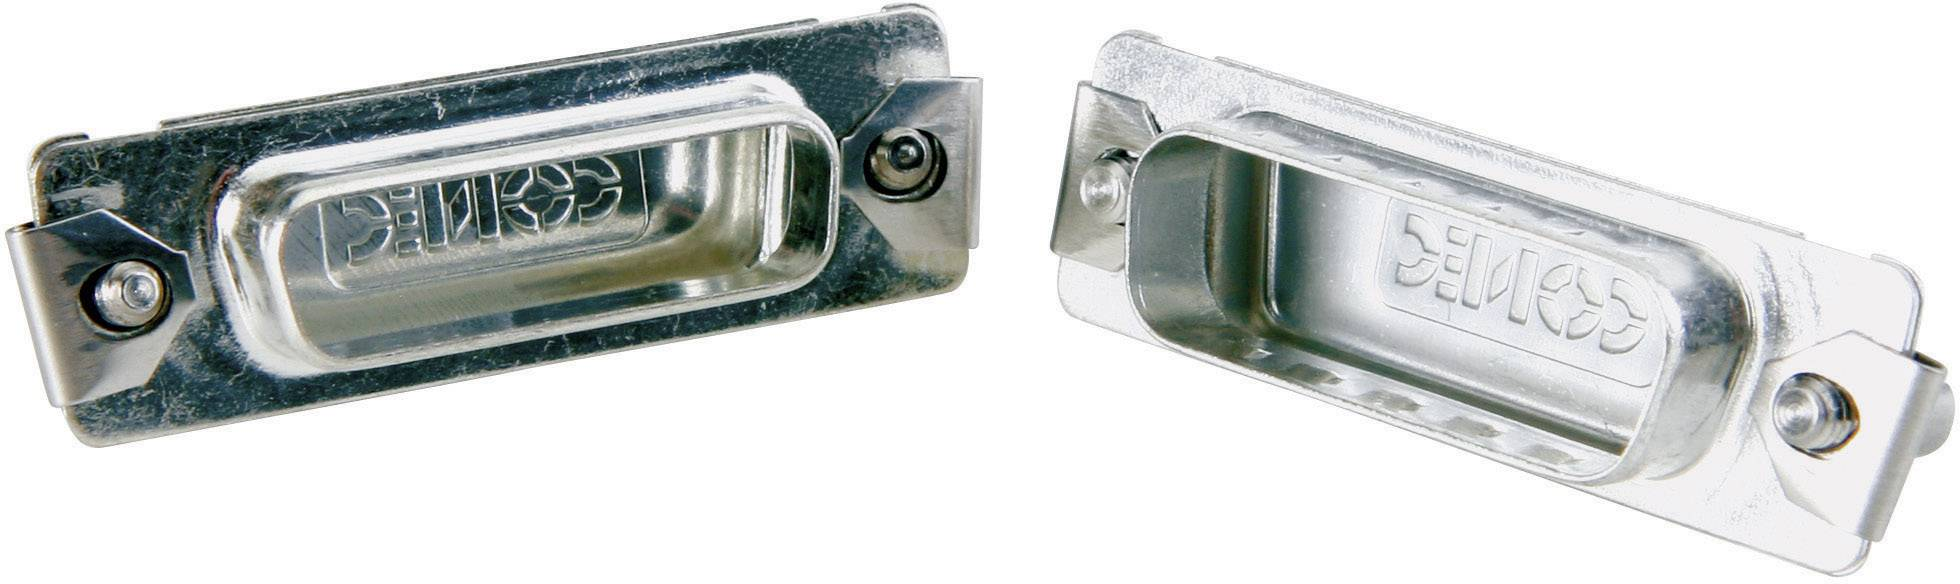 Záslepka D-SUB konektoru Conec 165X16759X pro 50pólovou D-SUB zásuvku, stříbrná, 1 ks